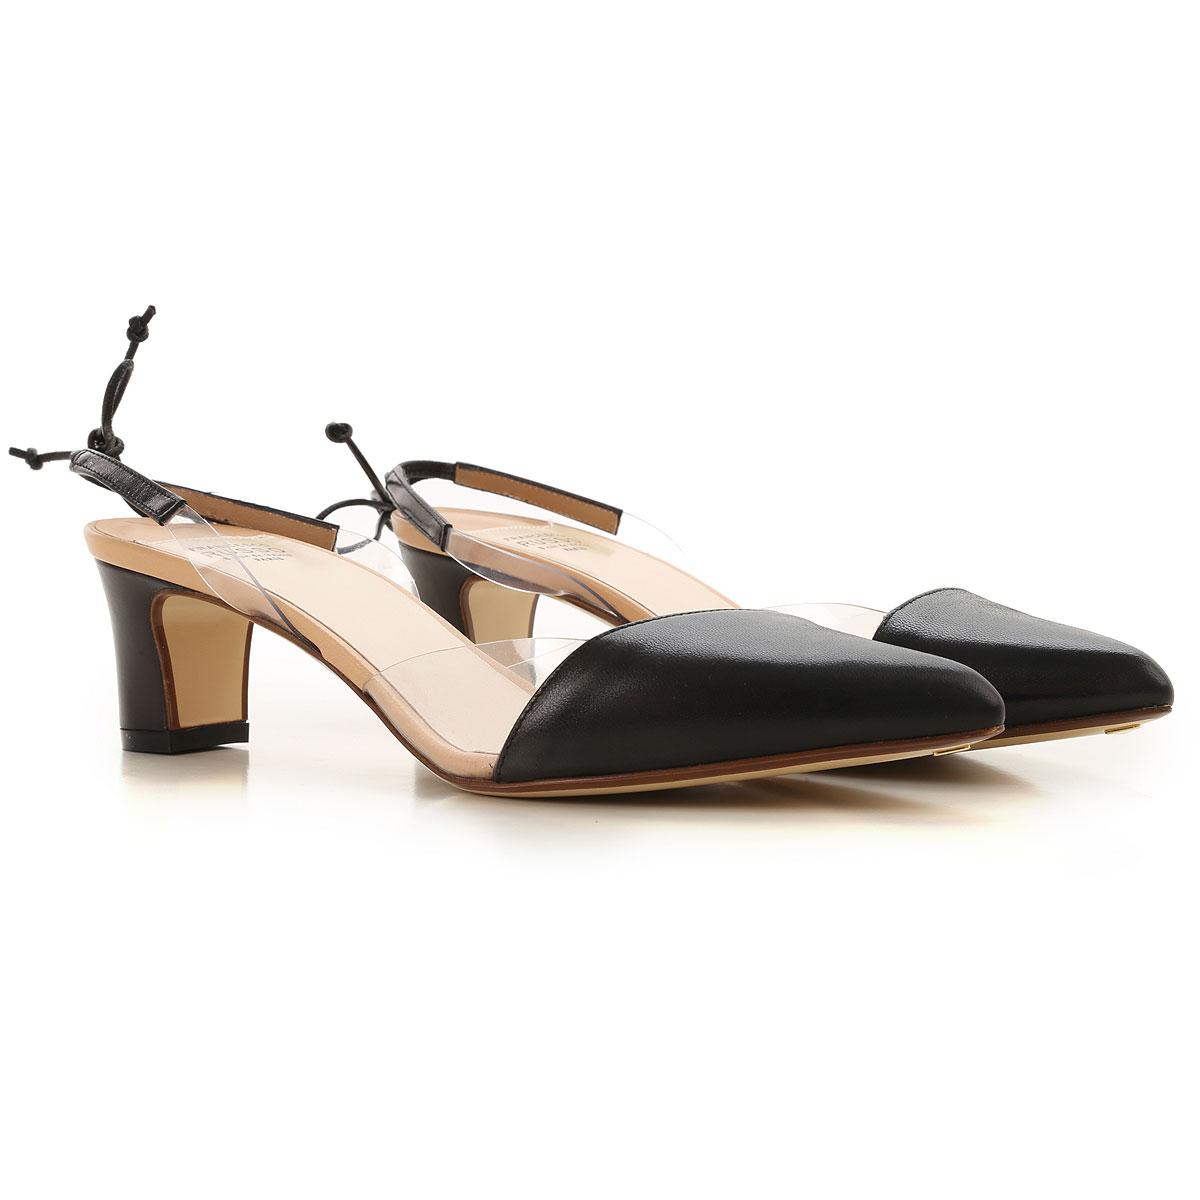 Francesco Russo Pumps & High Heels for Women On Sale in Outlet, Black, Leather, 2019, 6.5 8